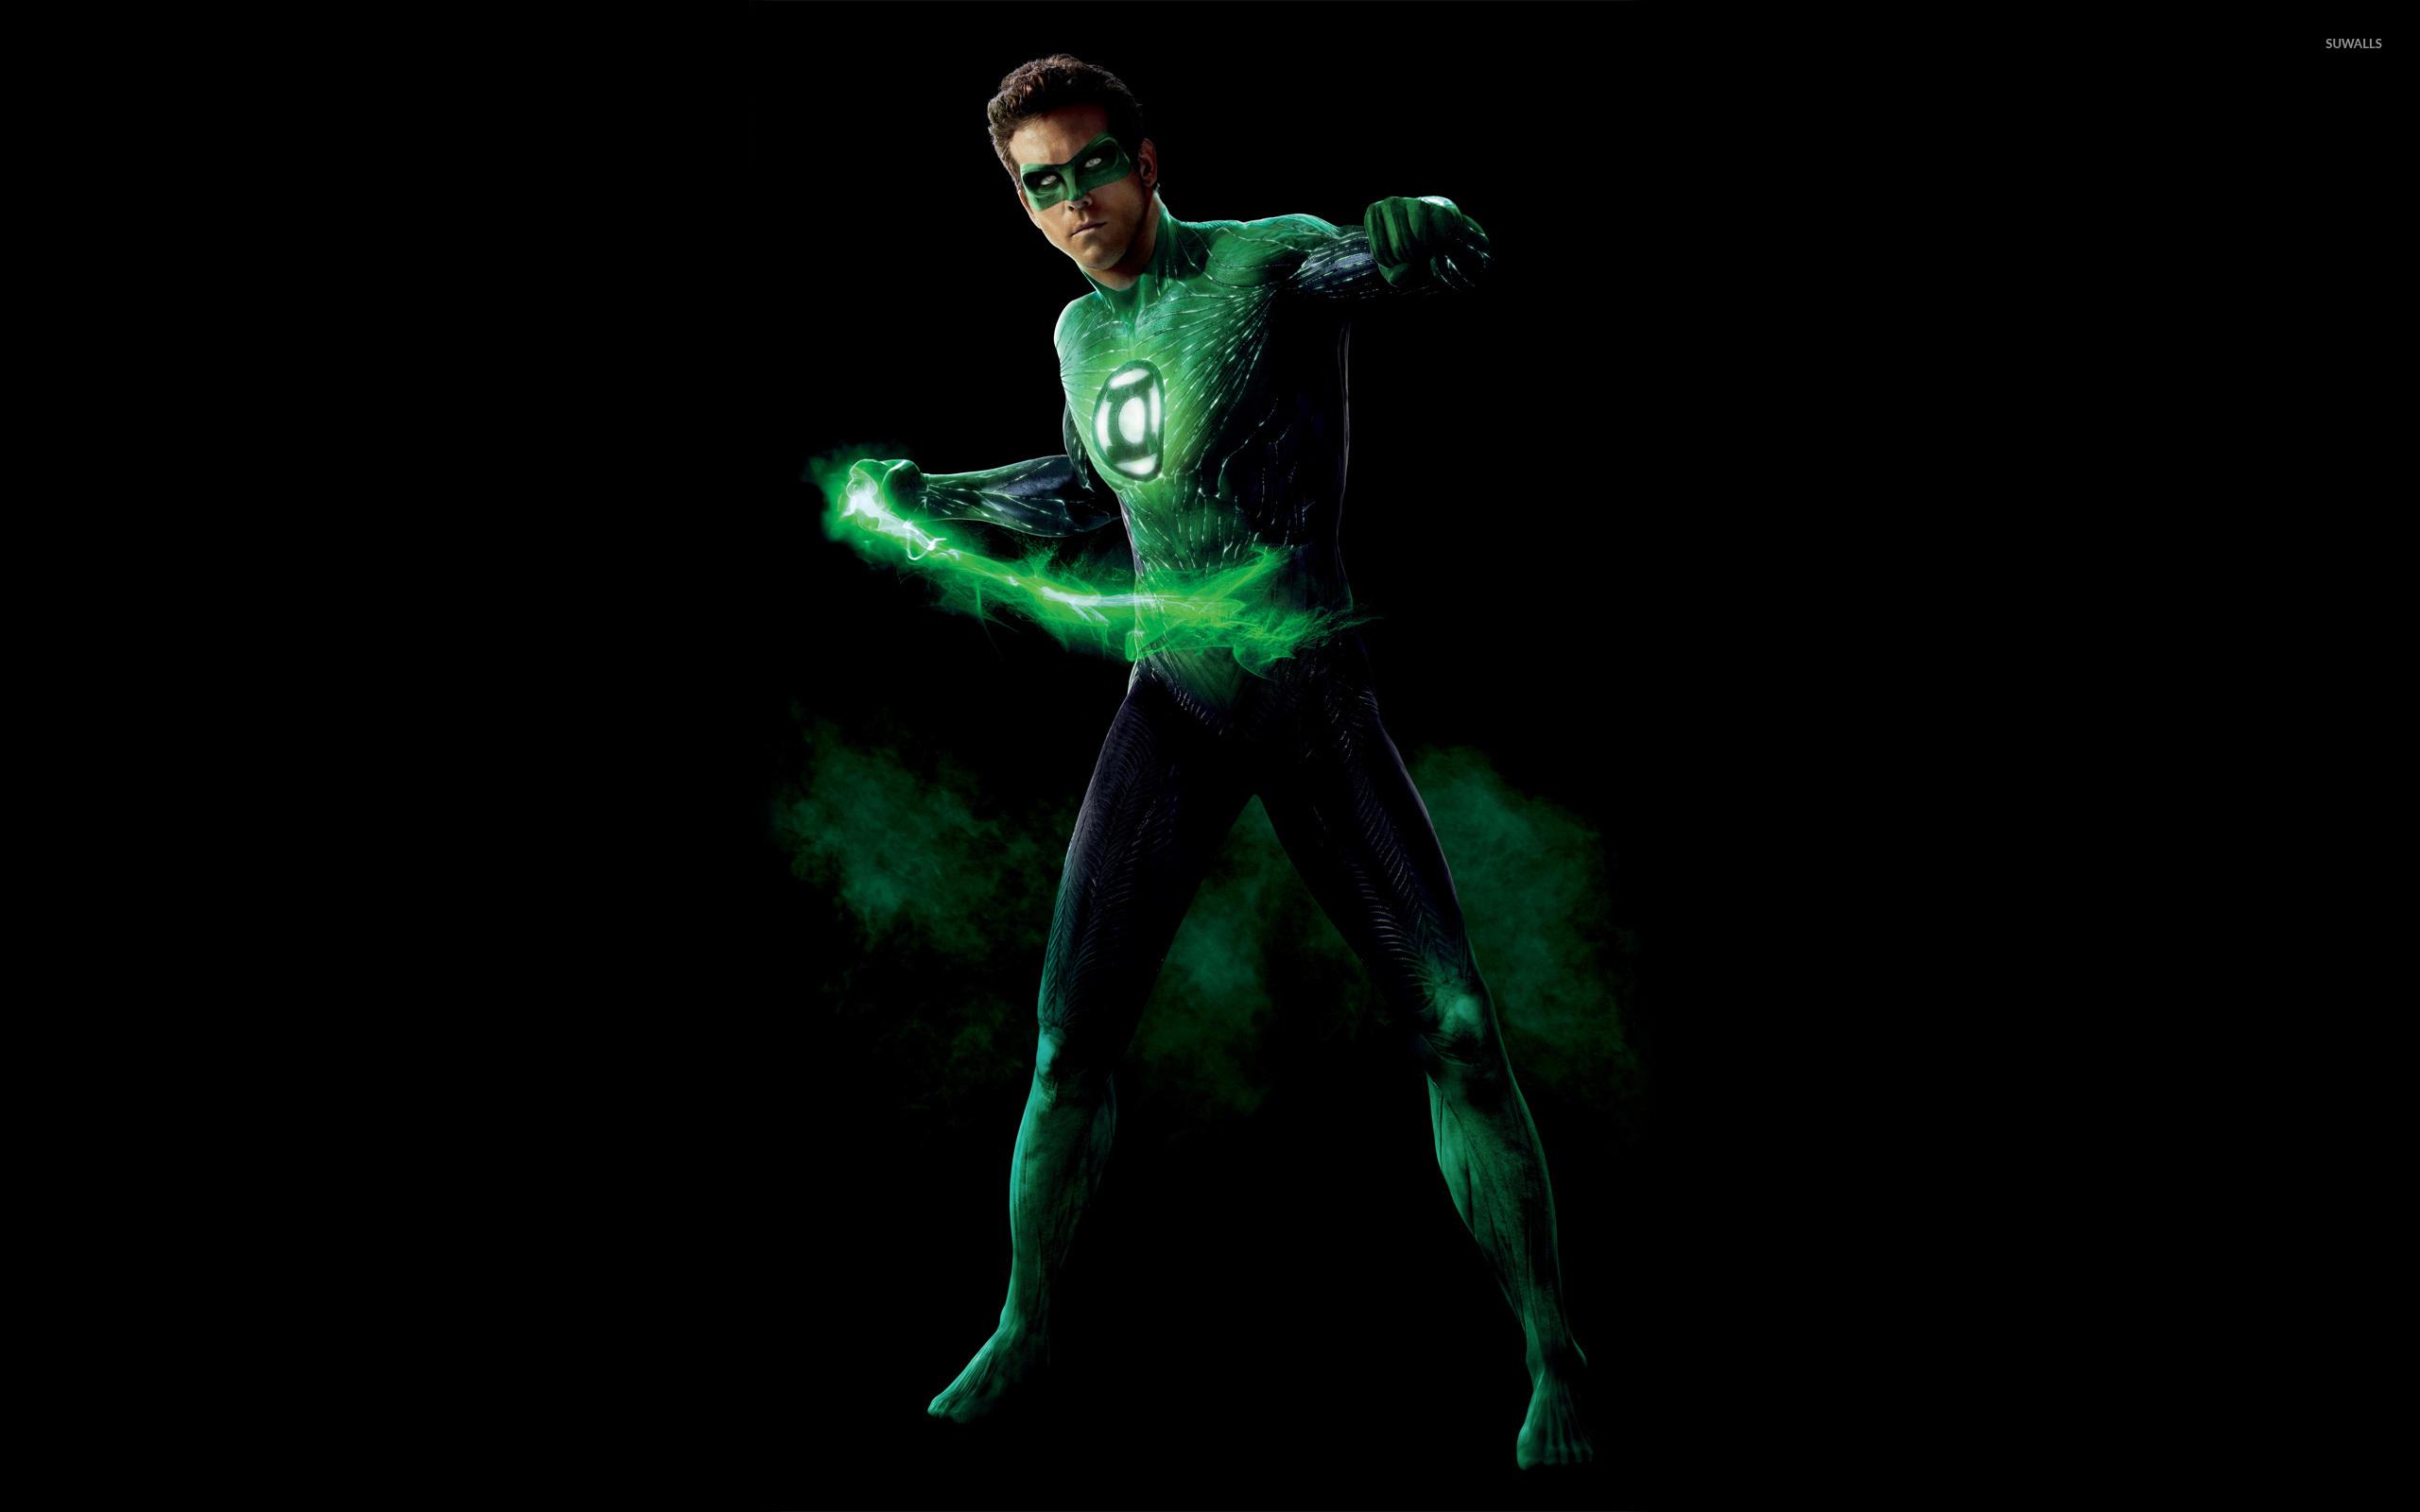 Green Lantern wallpaper   Movie wallpapers   4449 2560x1600